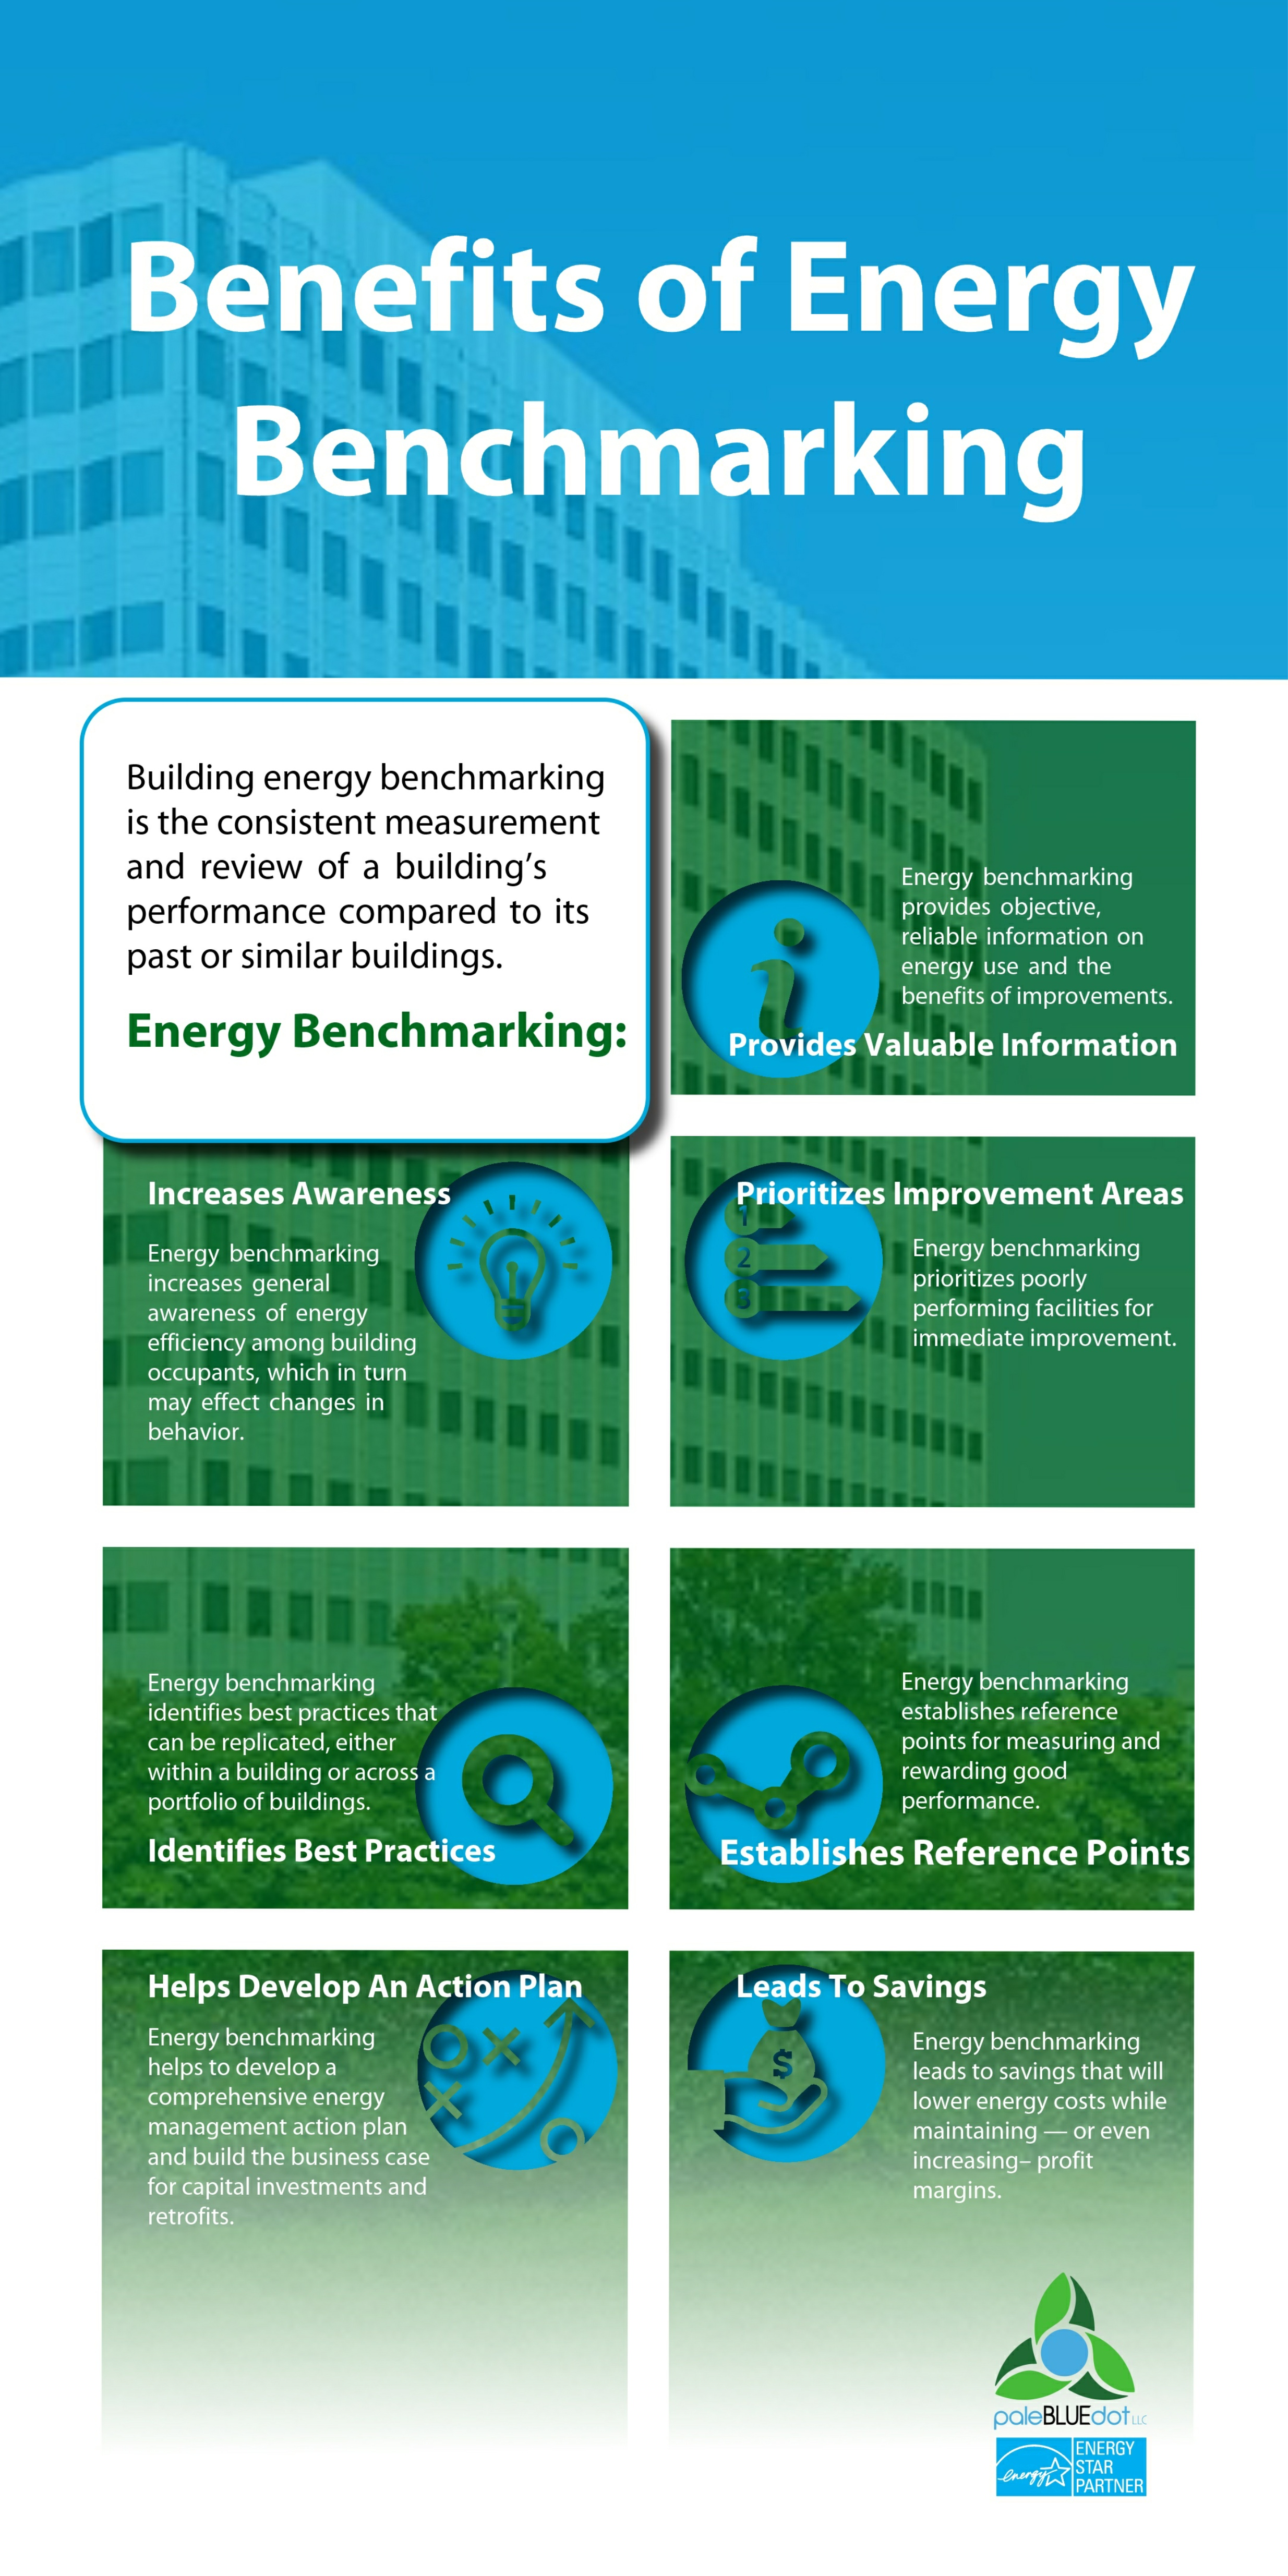 Benefits of Energy Benchmarking Infographic